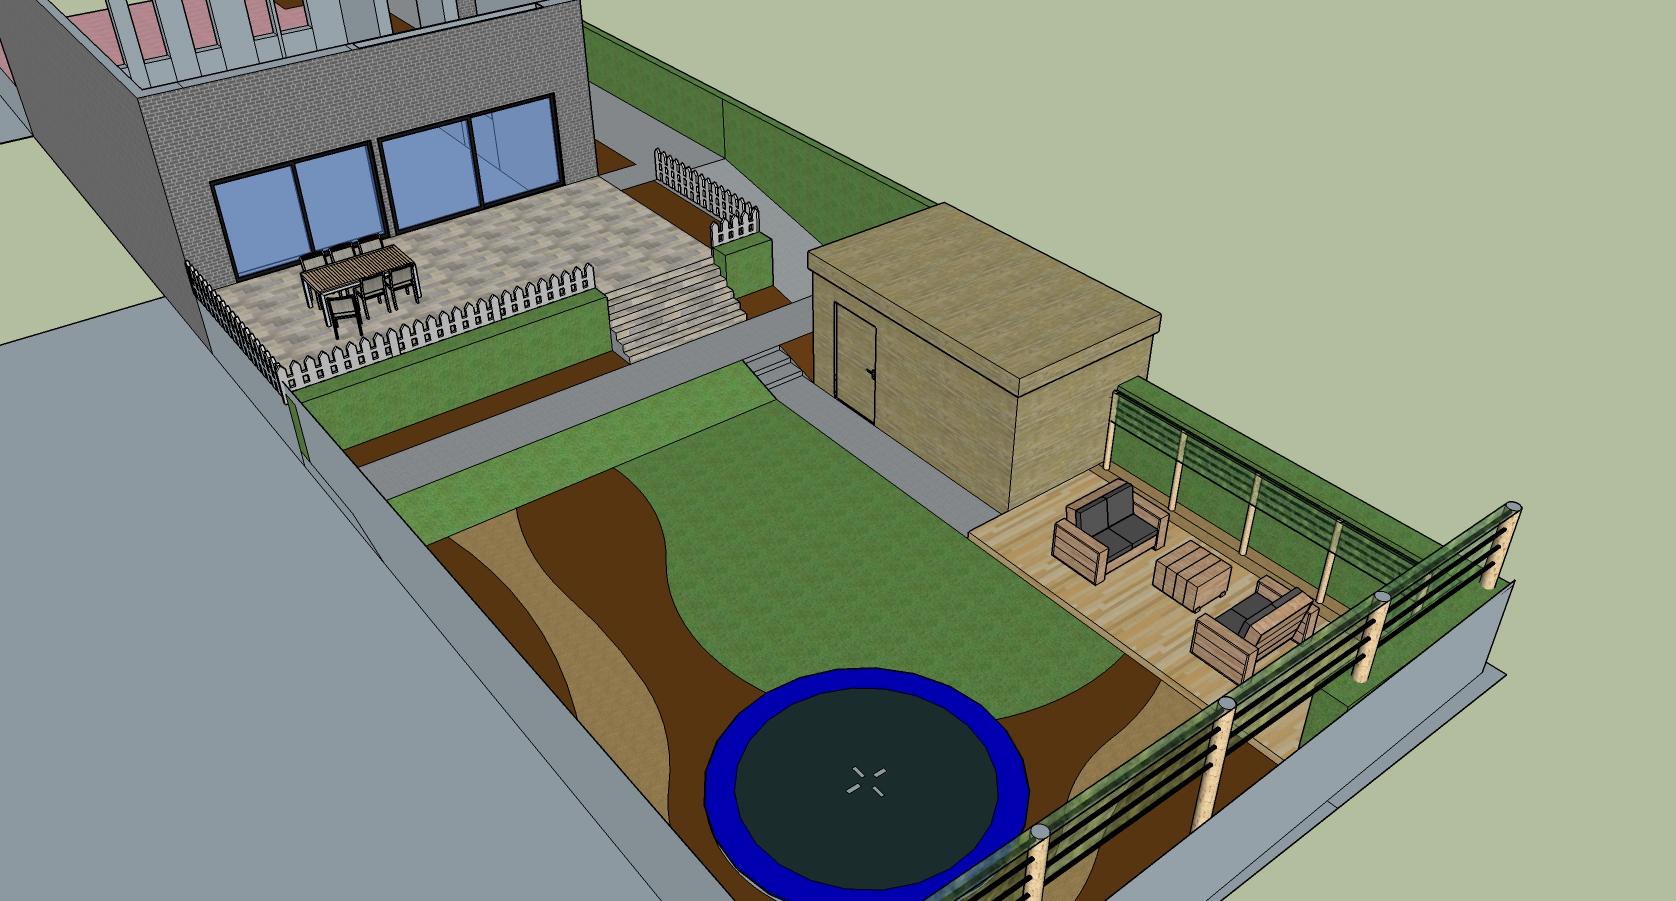 Kindvriendelijke tuin te Marke - LIV Green - Tuinarchitect